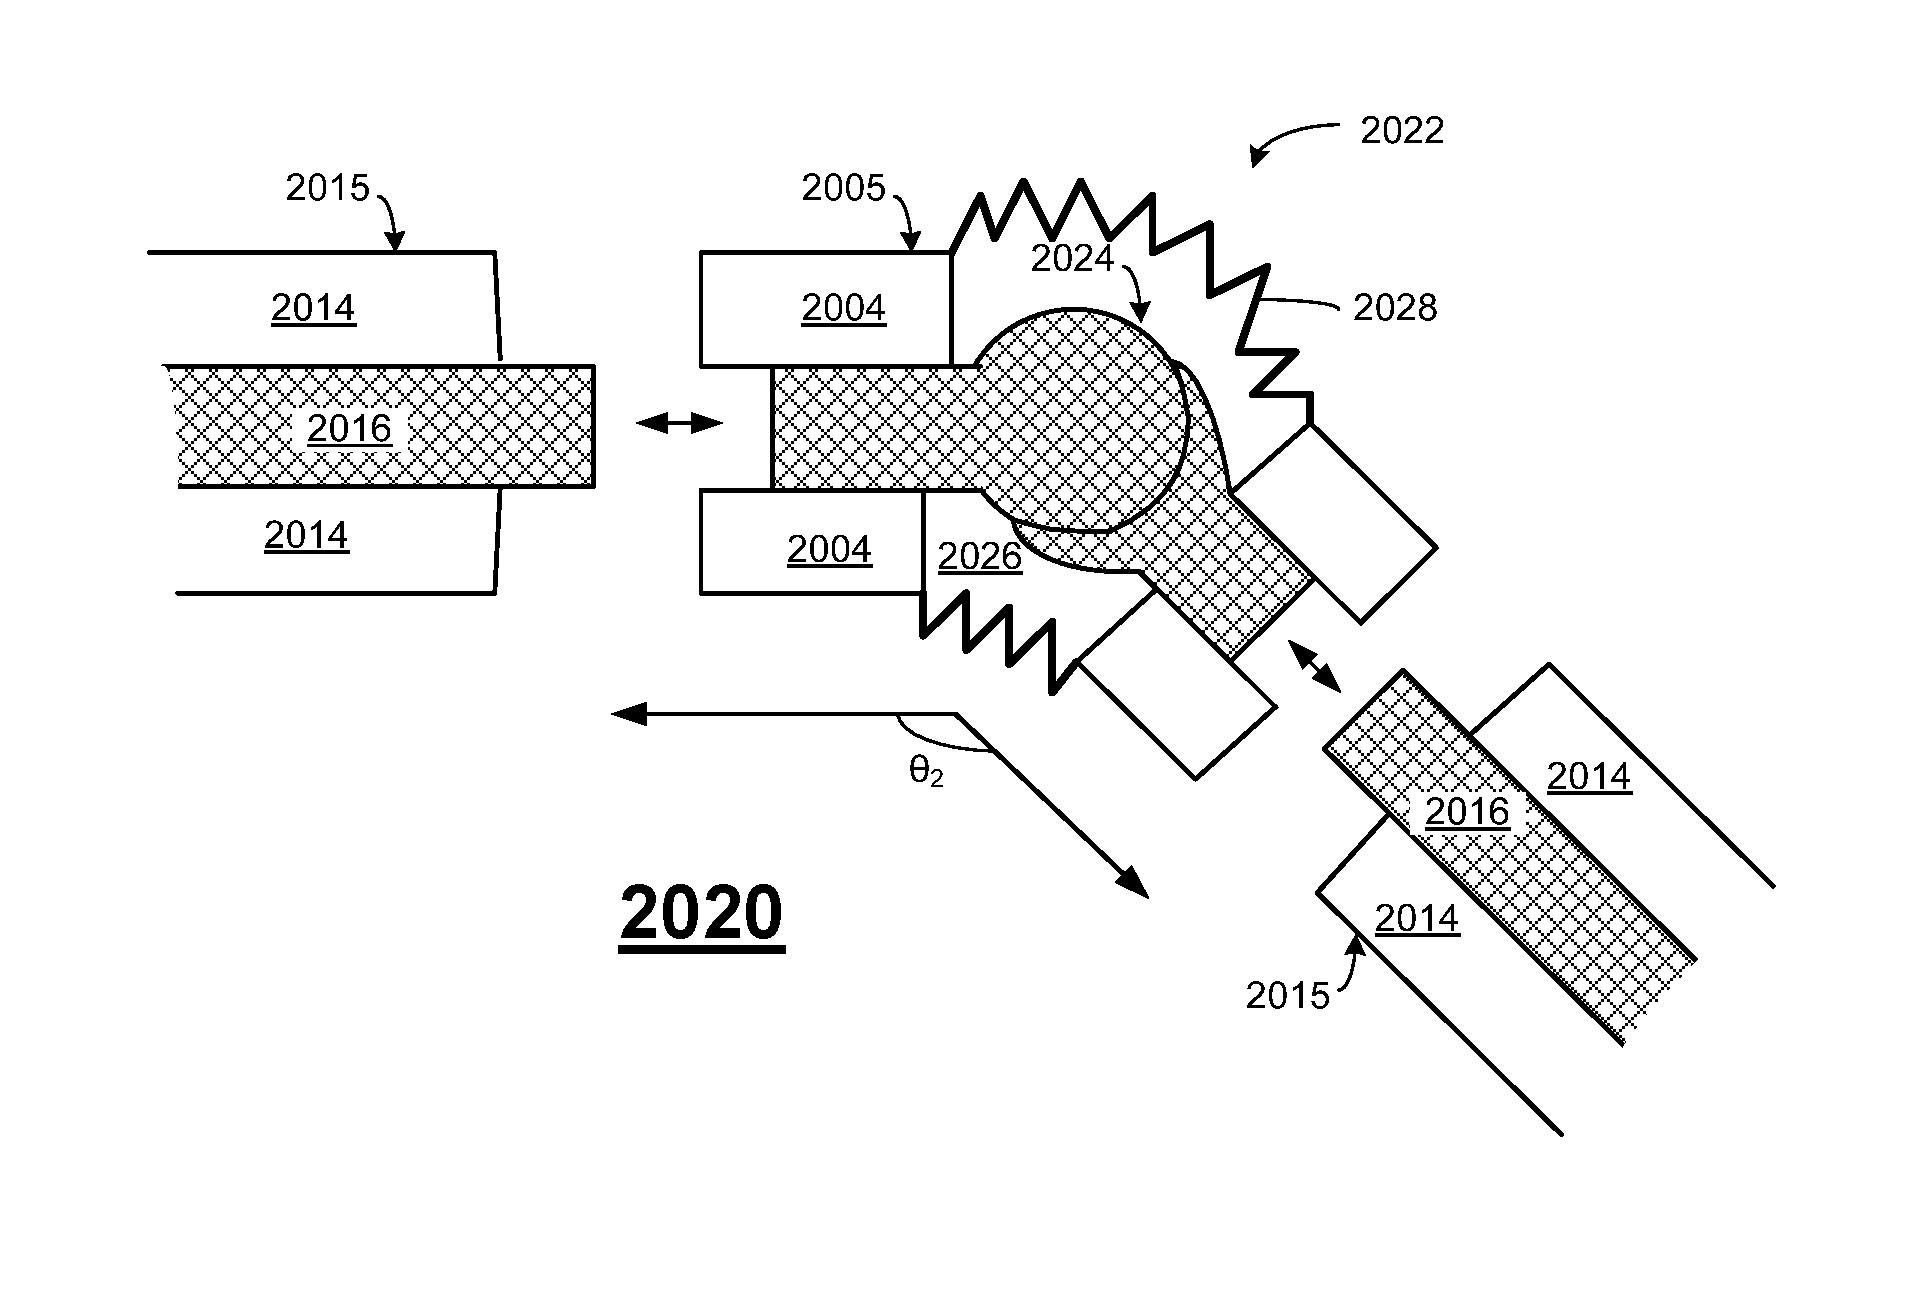 us9871283b2 transmission medium having a dielectric core comprised rh patents google com